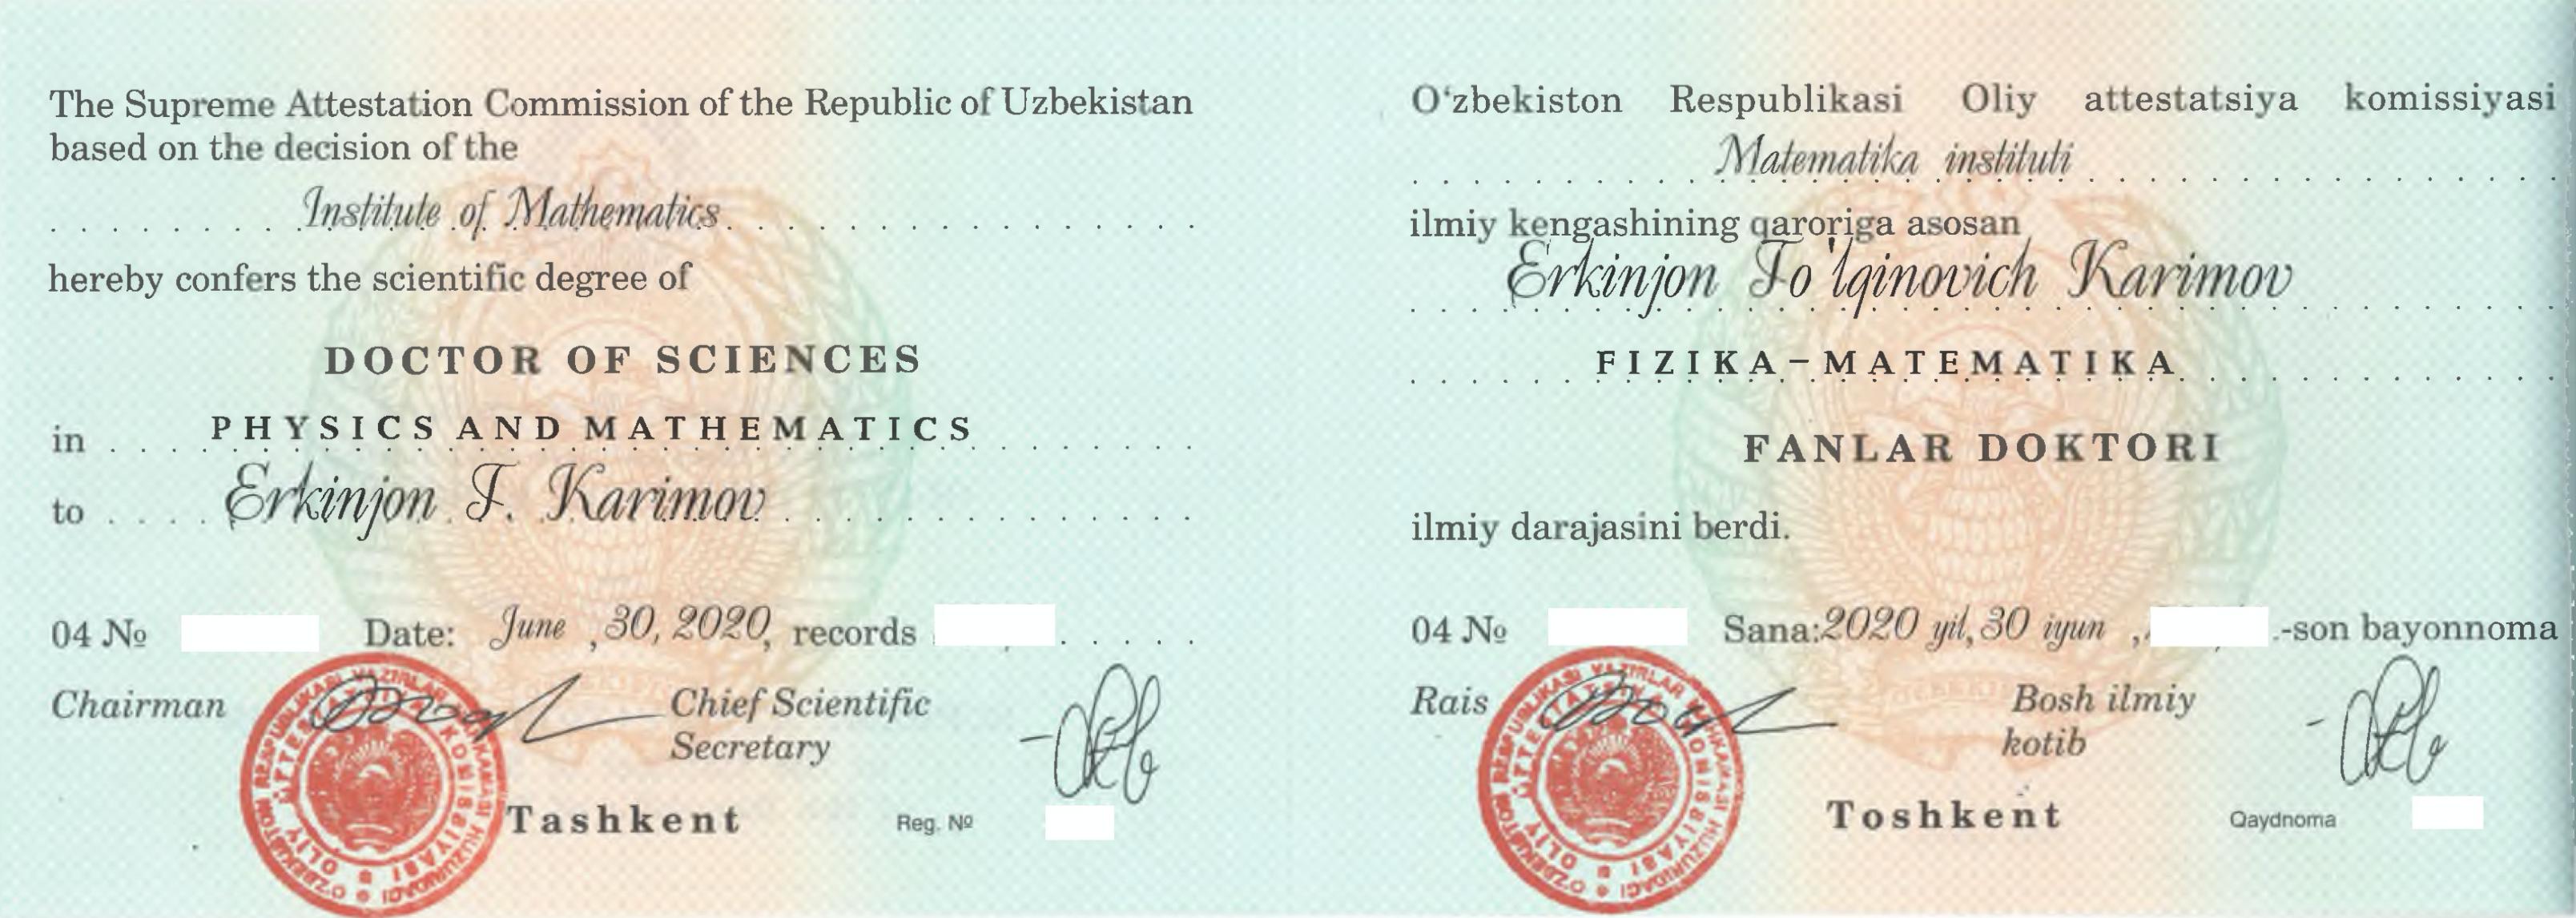 Doctor of Science: Erkinjon Karimov